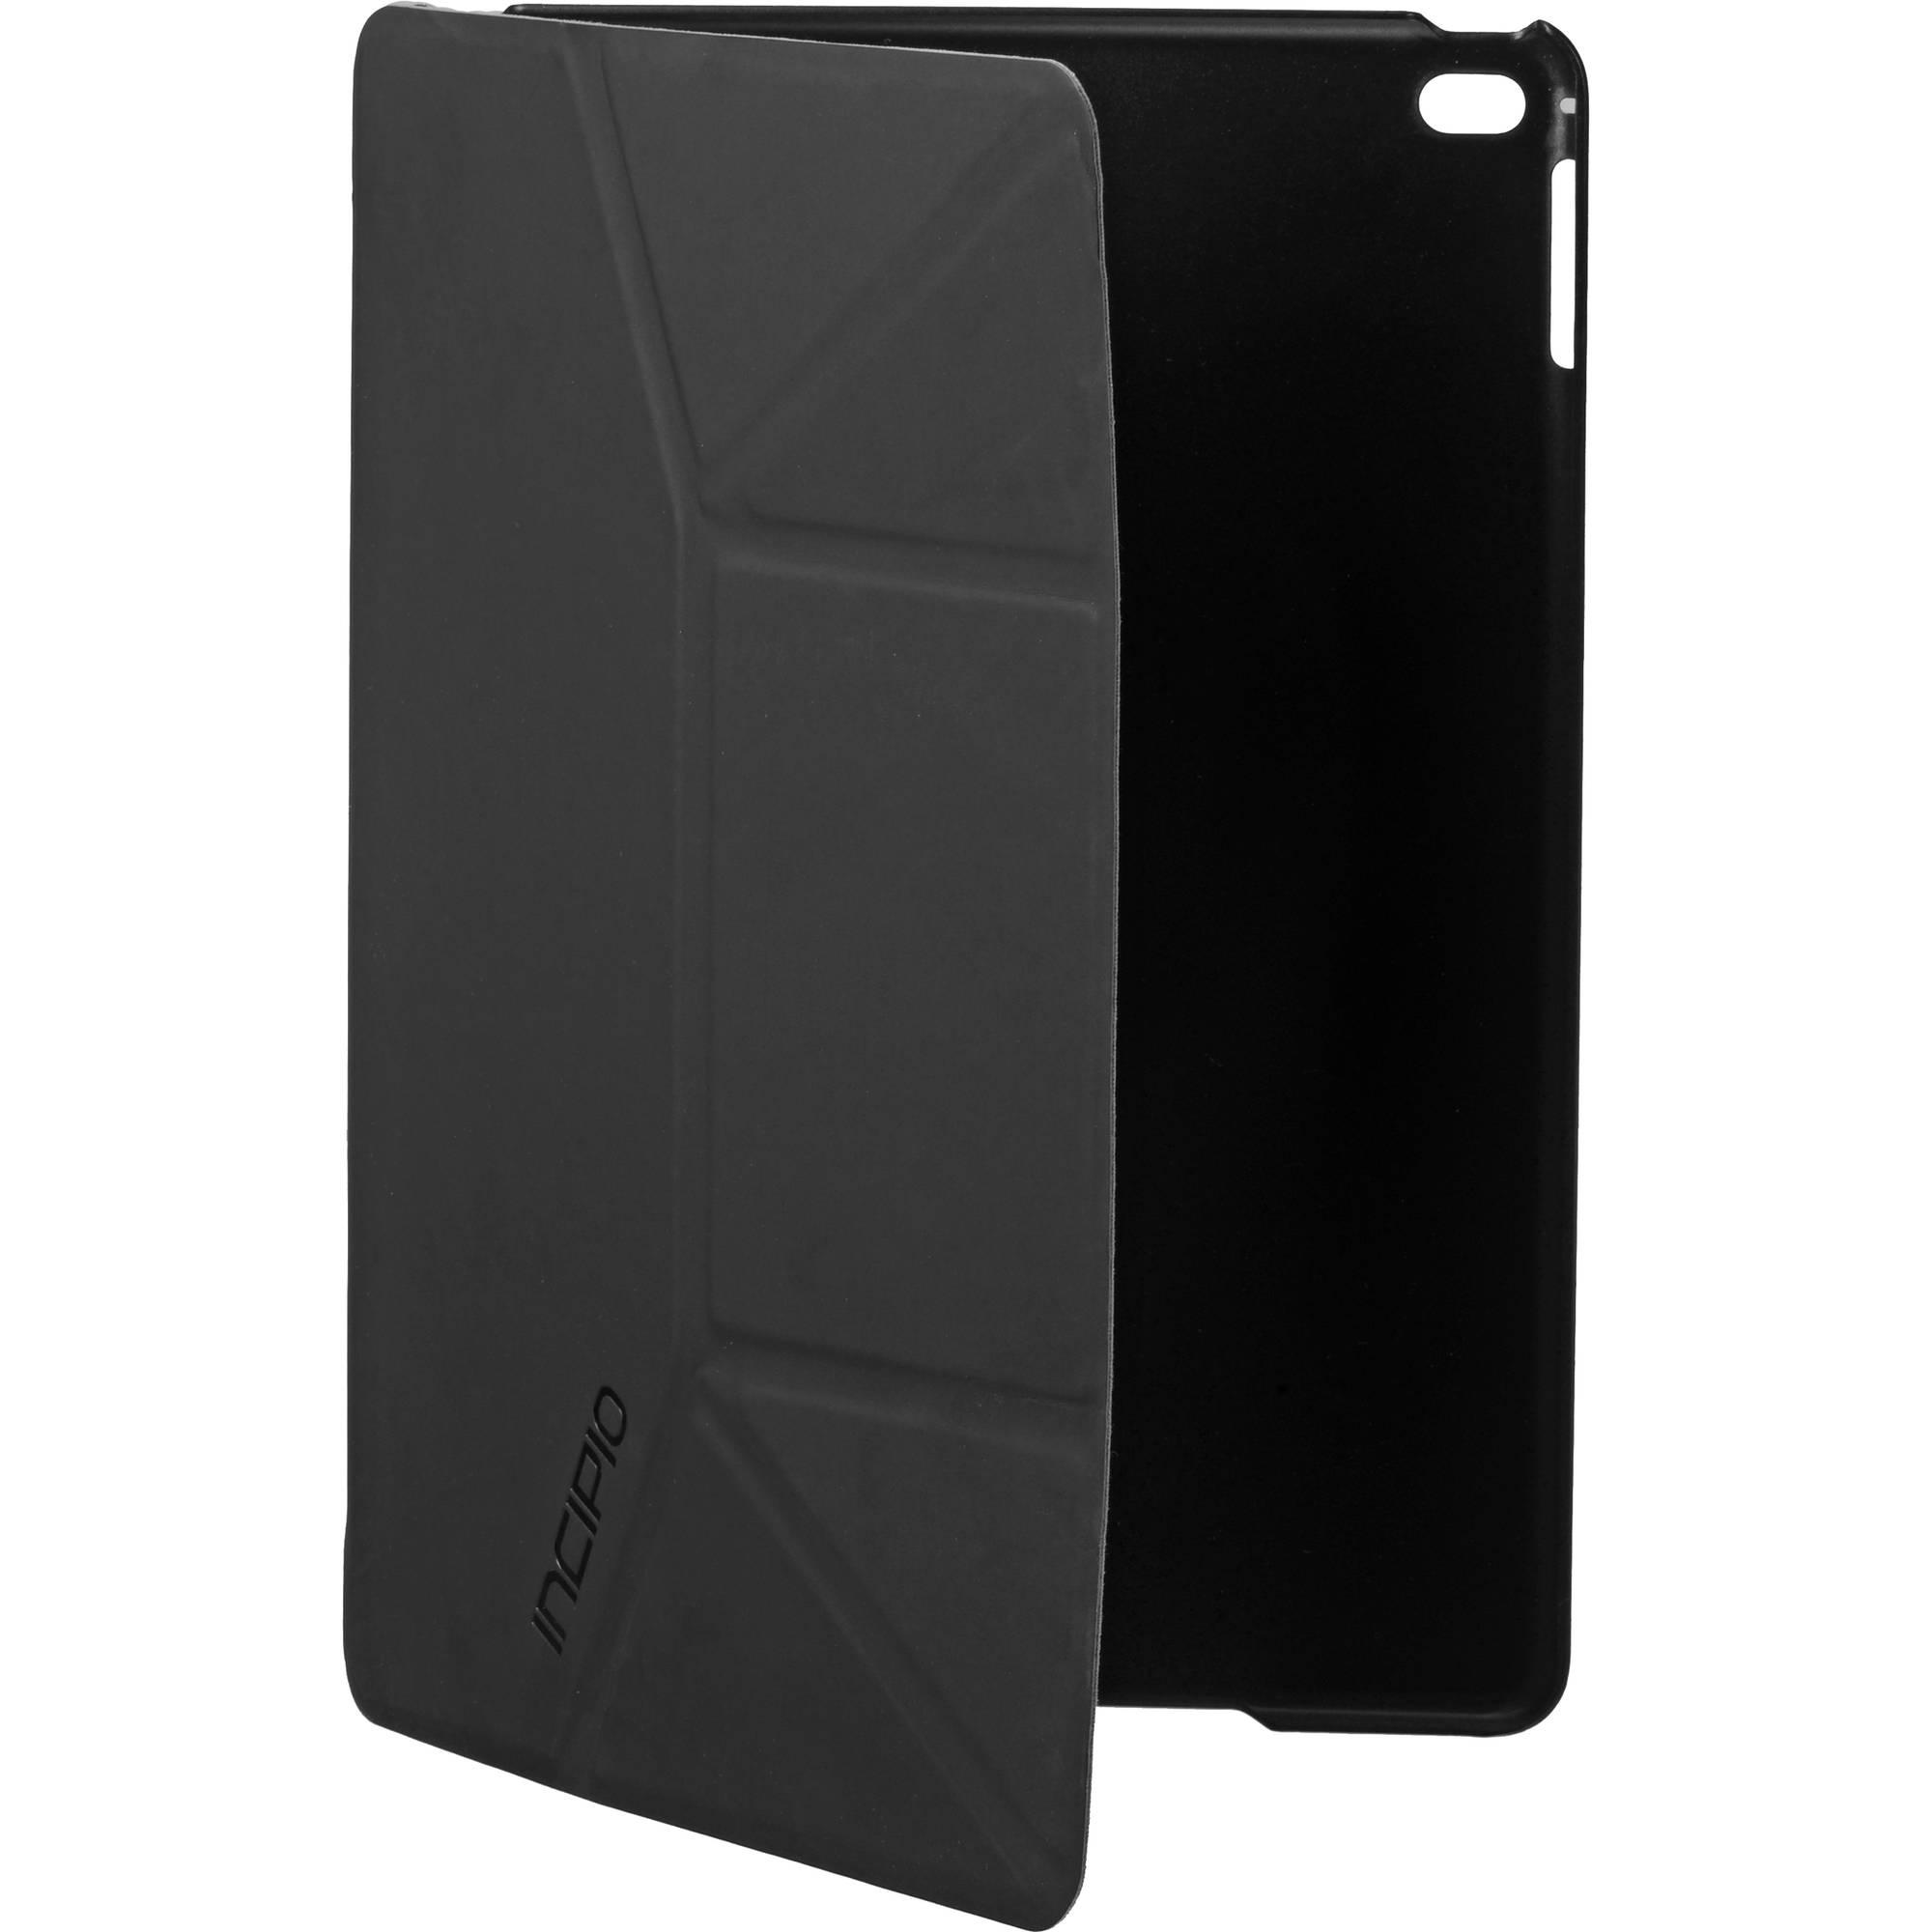 differently c3ac5 678b6 Incipio LGND Premium Hard Shell Folio for iPad Air 2 IPD-356-GRY